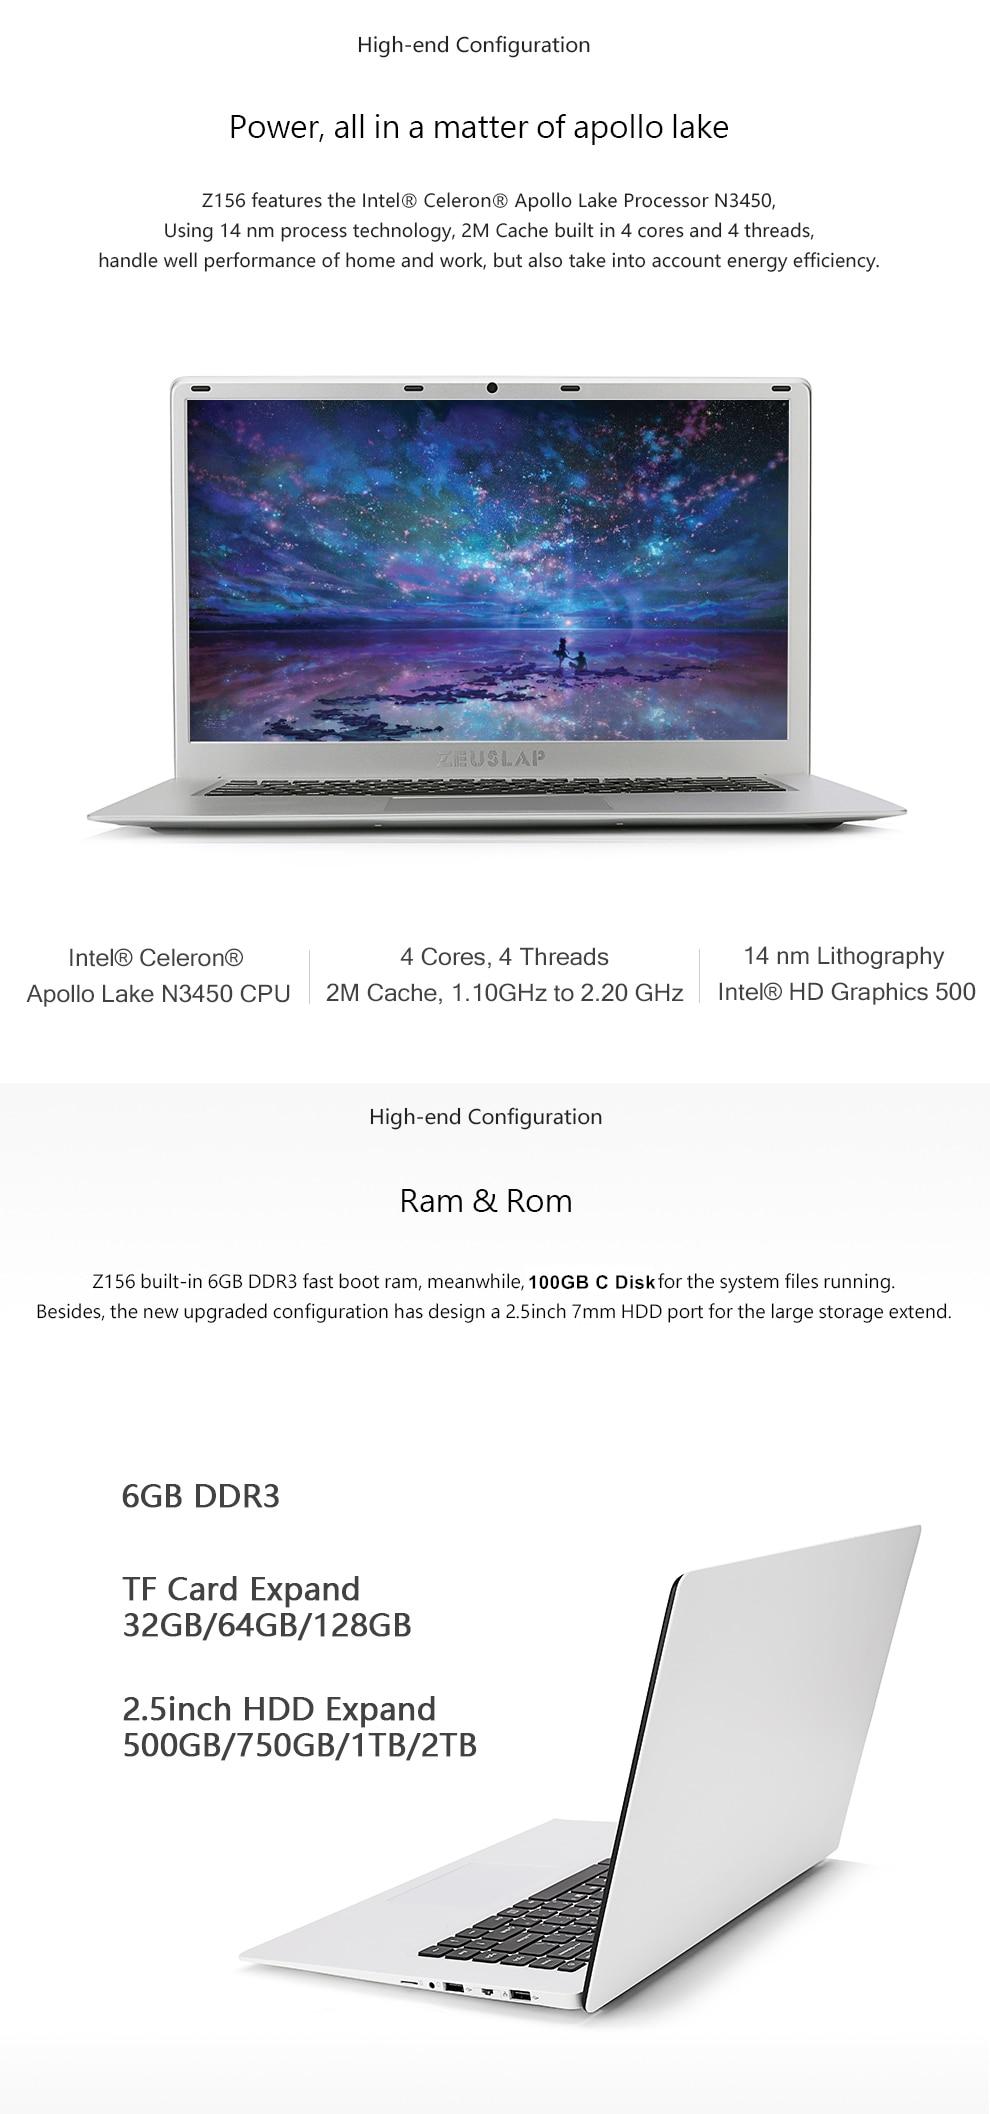 US $360 0 25% OFF|ZEUSLAP 15 6 inch 6GB Ram 2TB HDD 1920x1080P Intel Quad  Core CPU Windows 10 System Wifi Bluetooth Laptop Notebook PC Computer-in